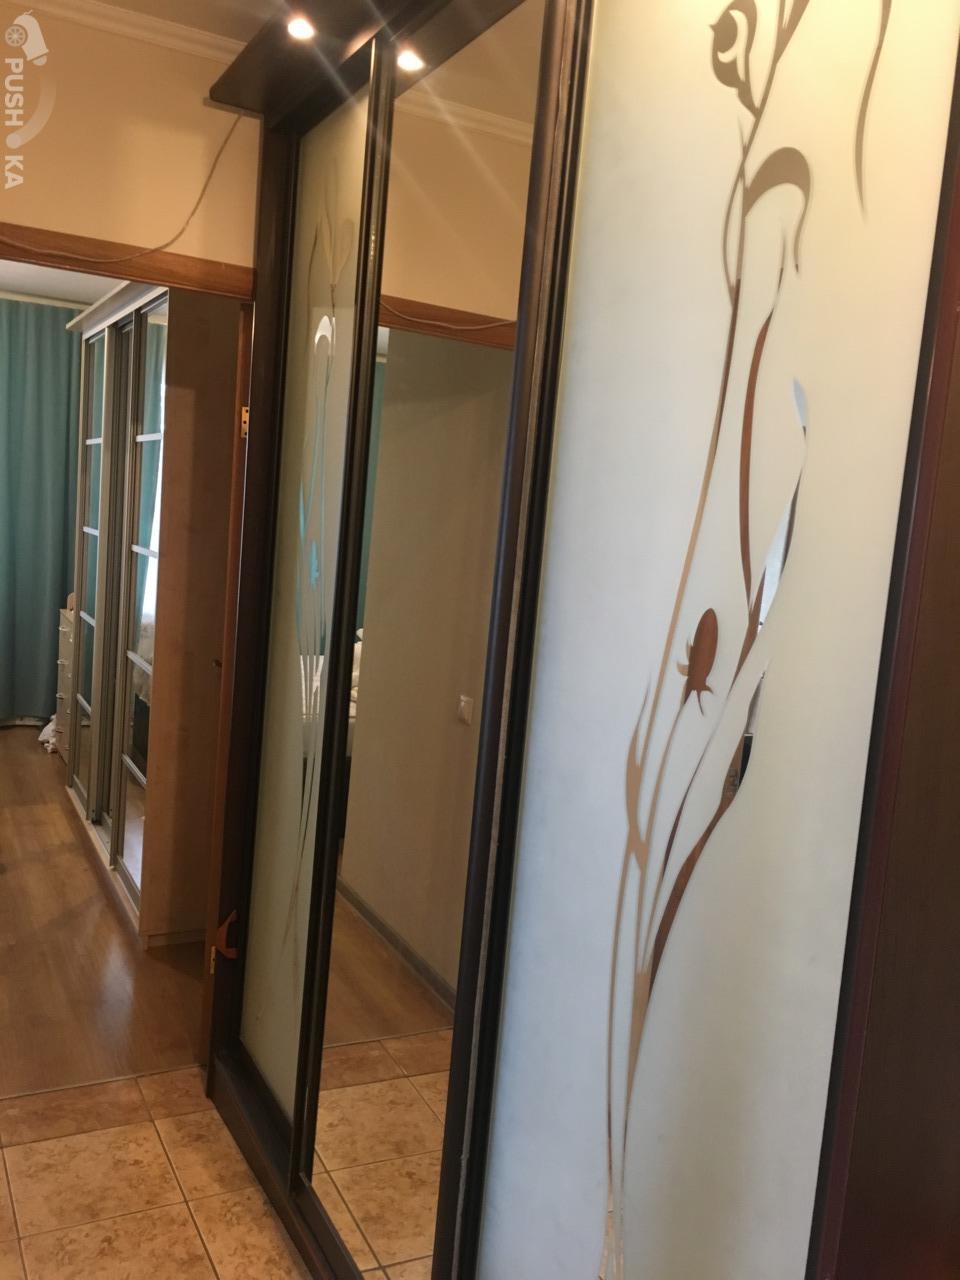 Продаётся 3-комнатная квартира 54.0 кв.м. этаж 6/12 за 10 000 000 руб